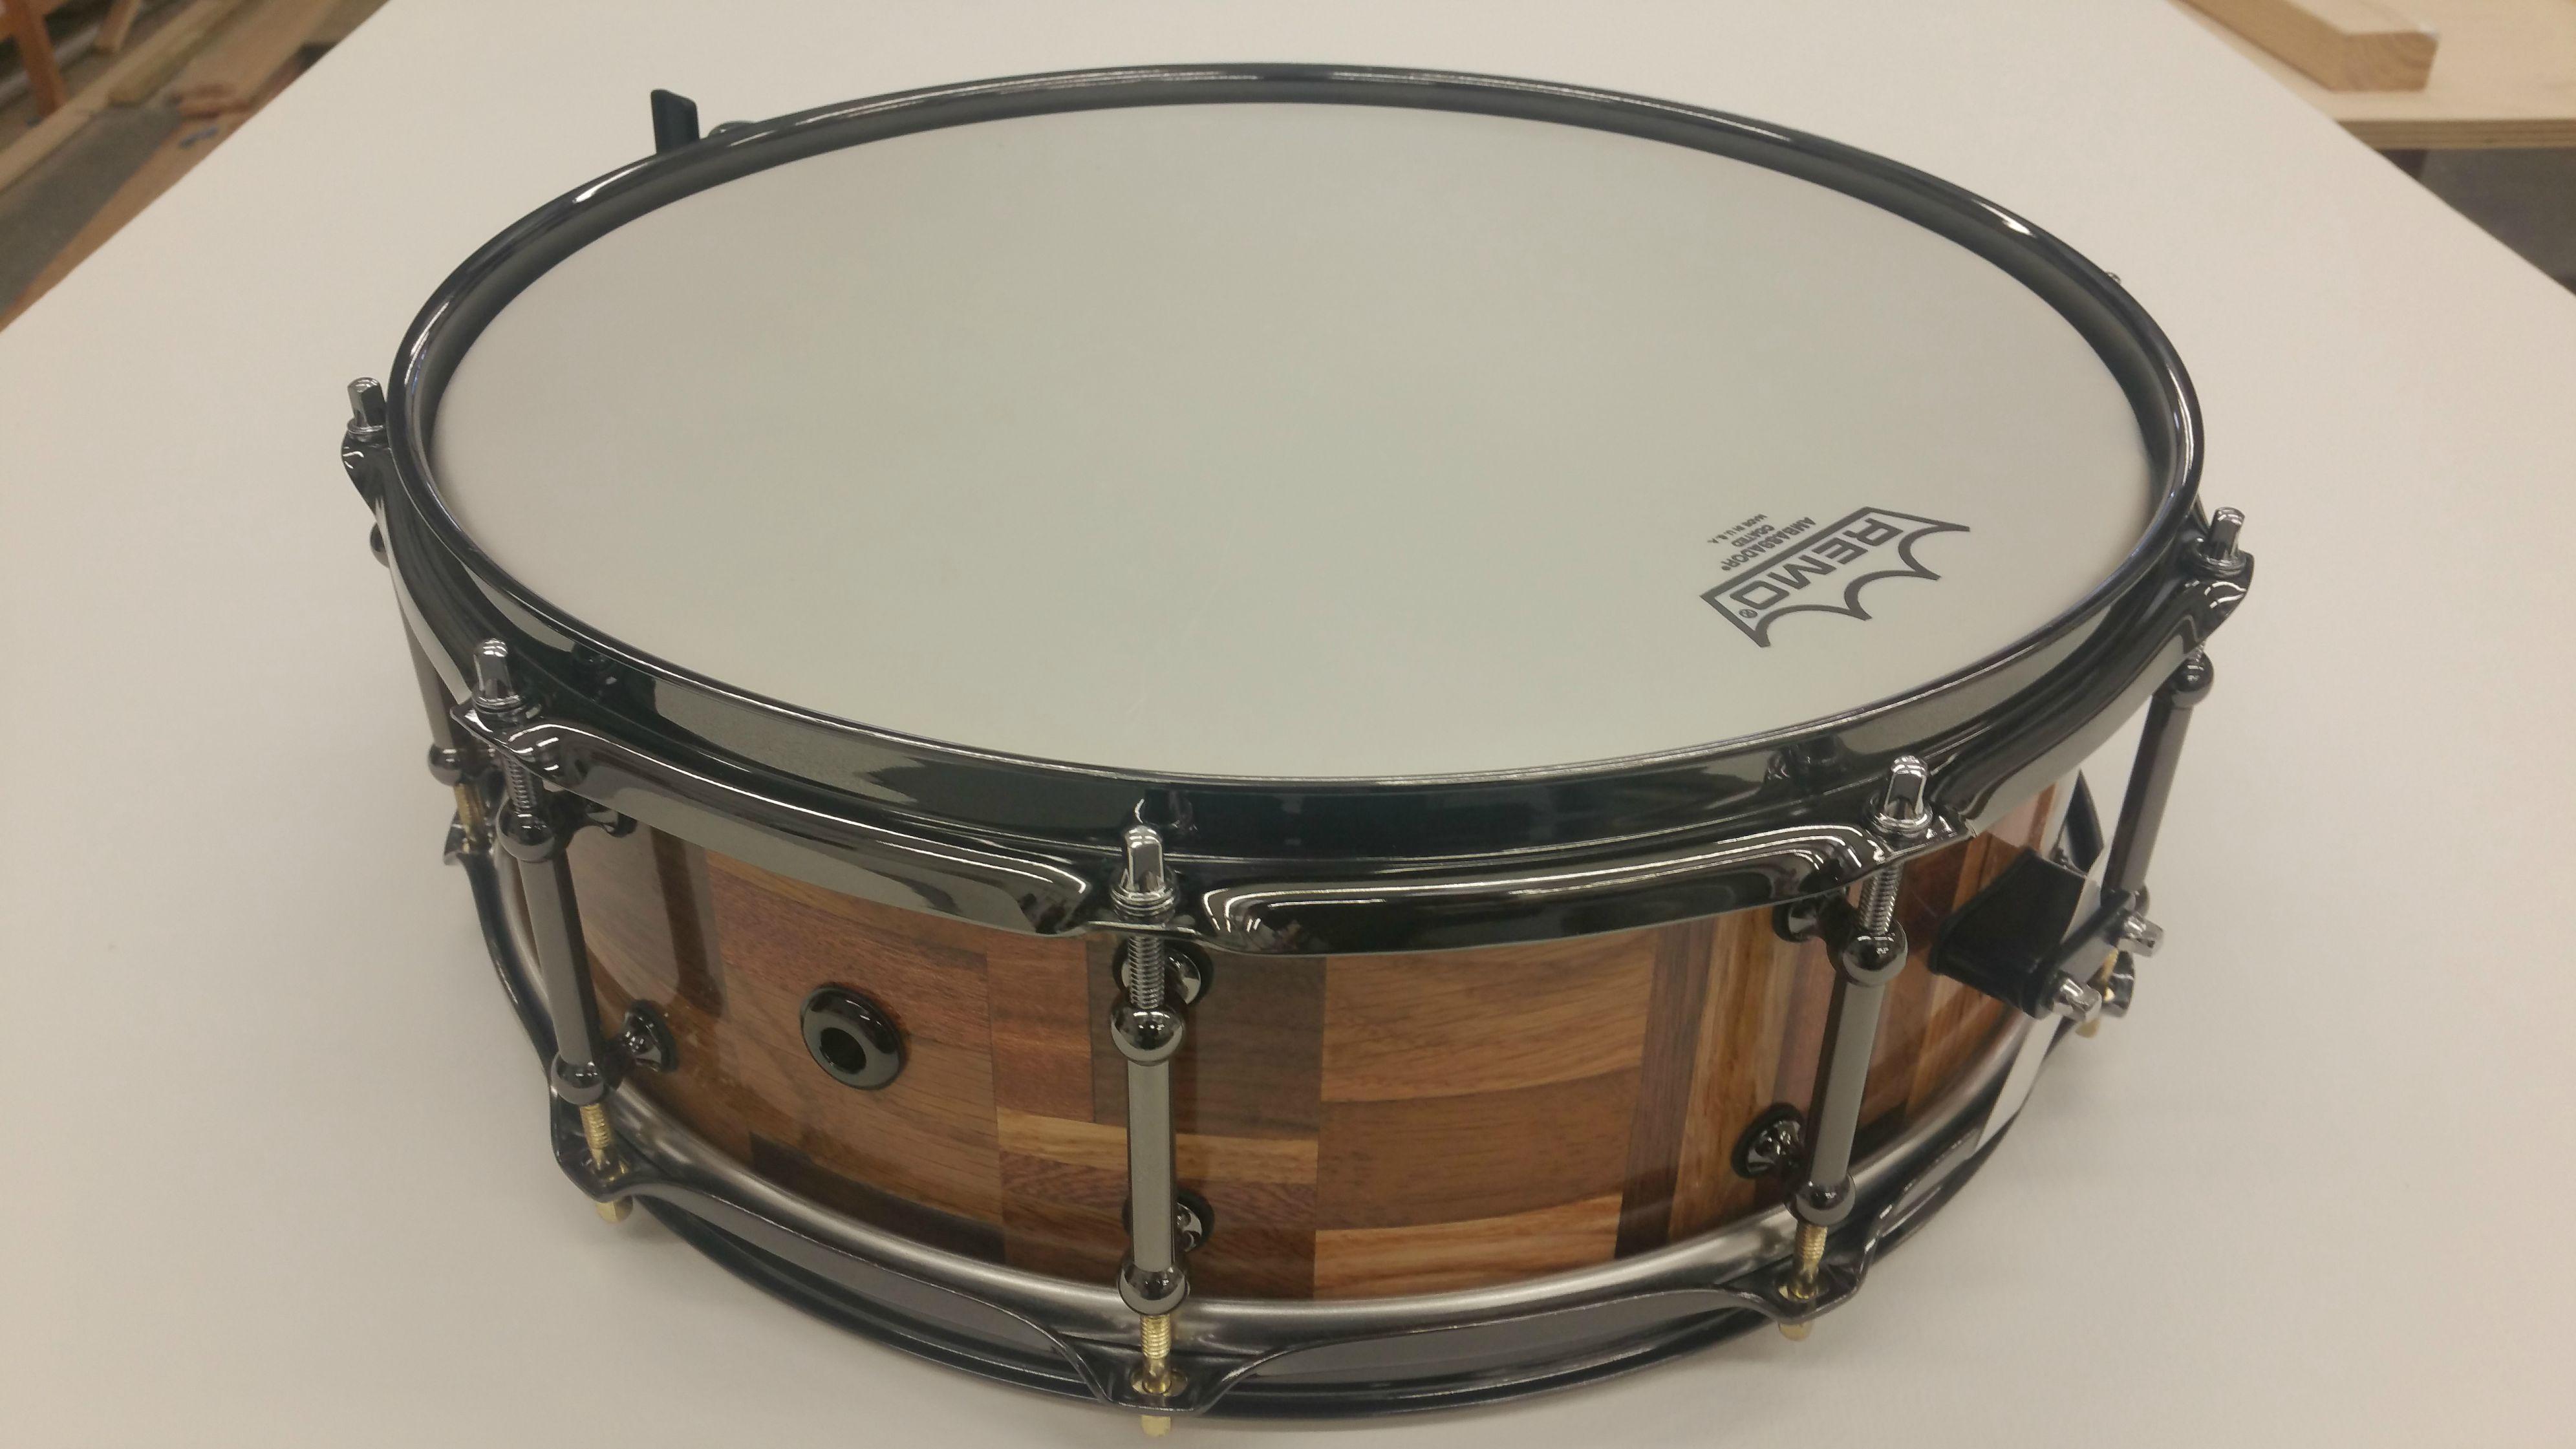 Beautiful Snare Drum Built from Scrap Wood